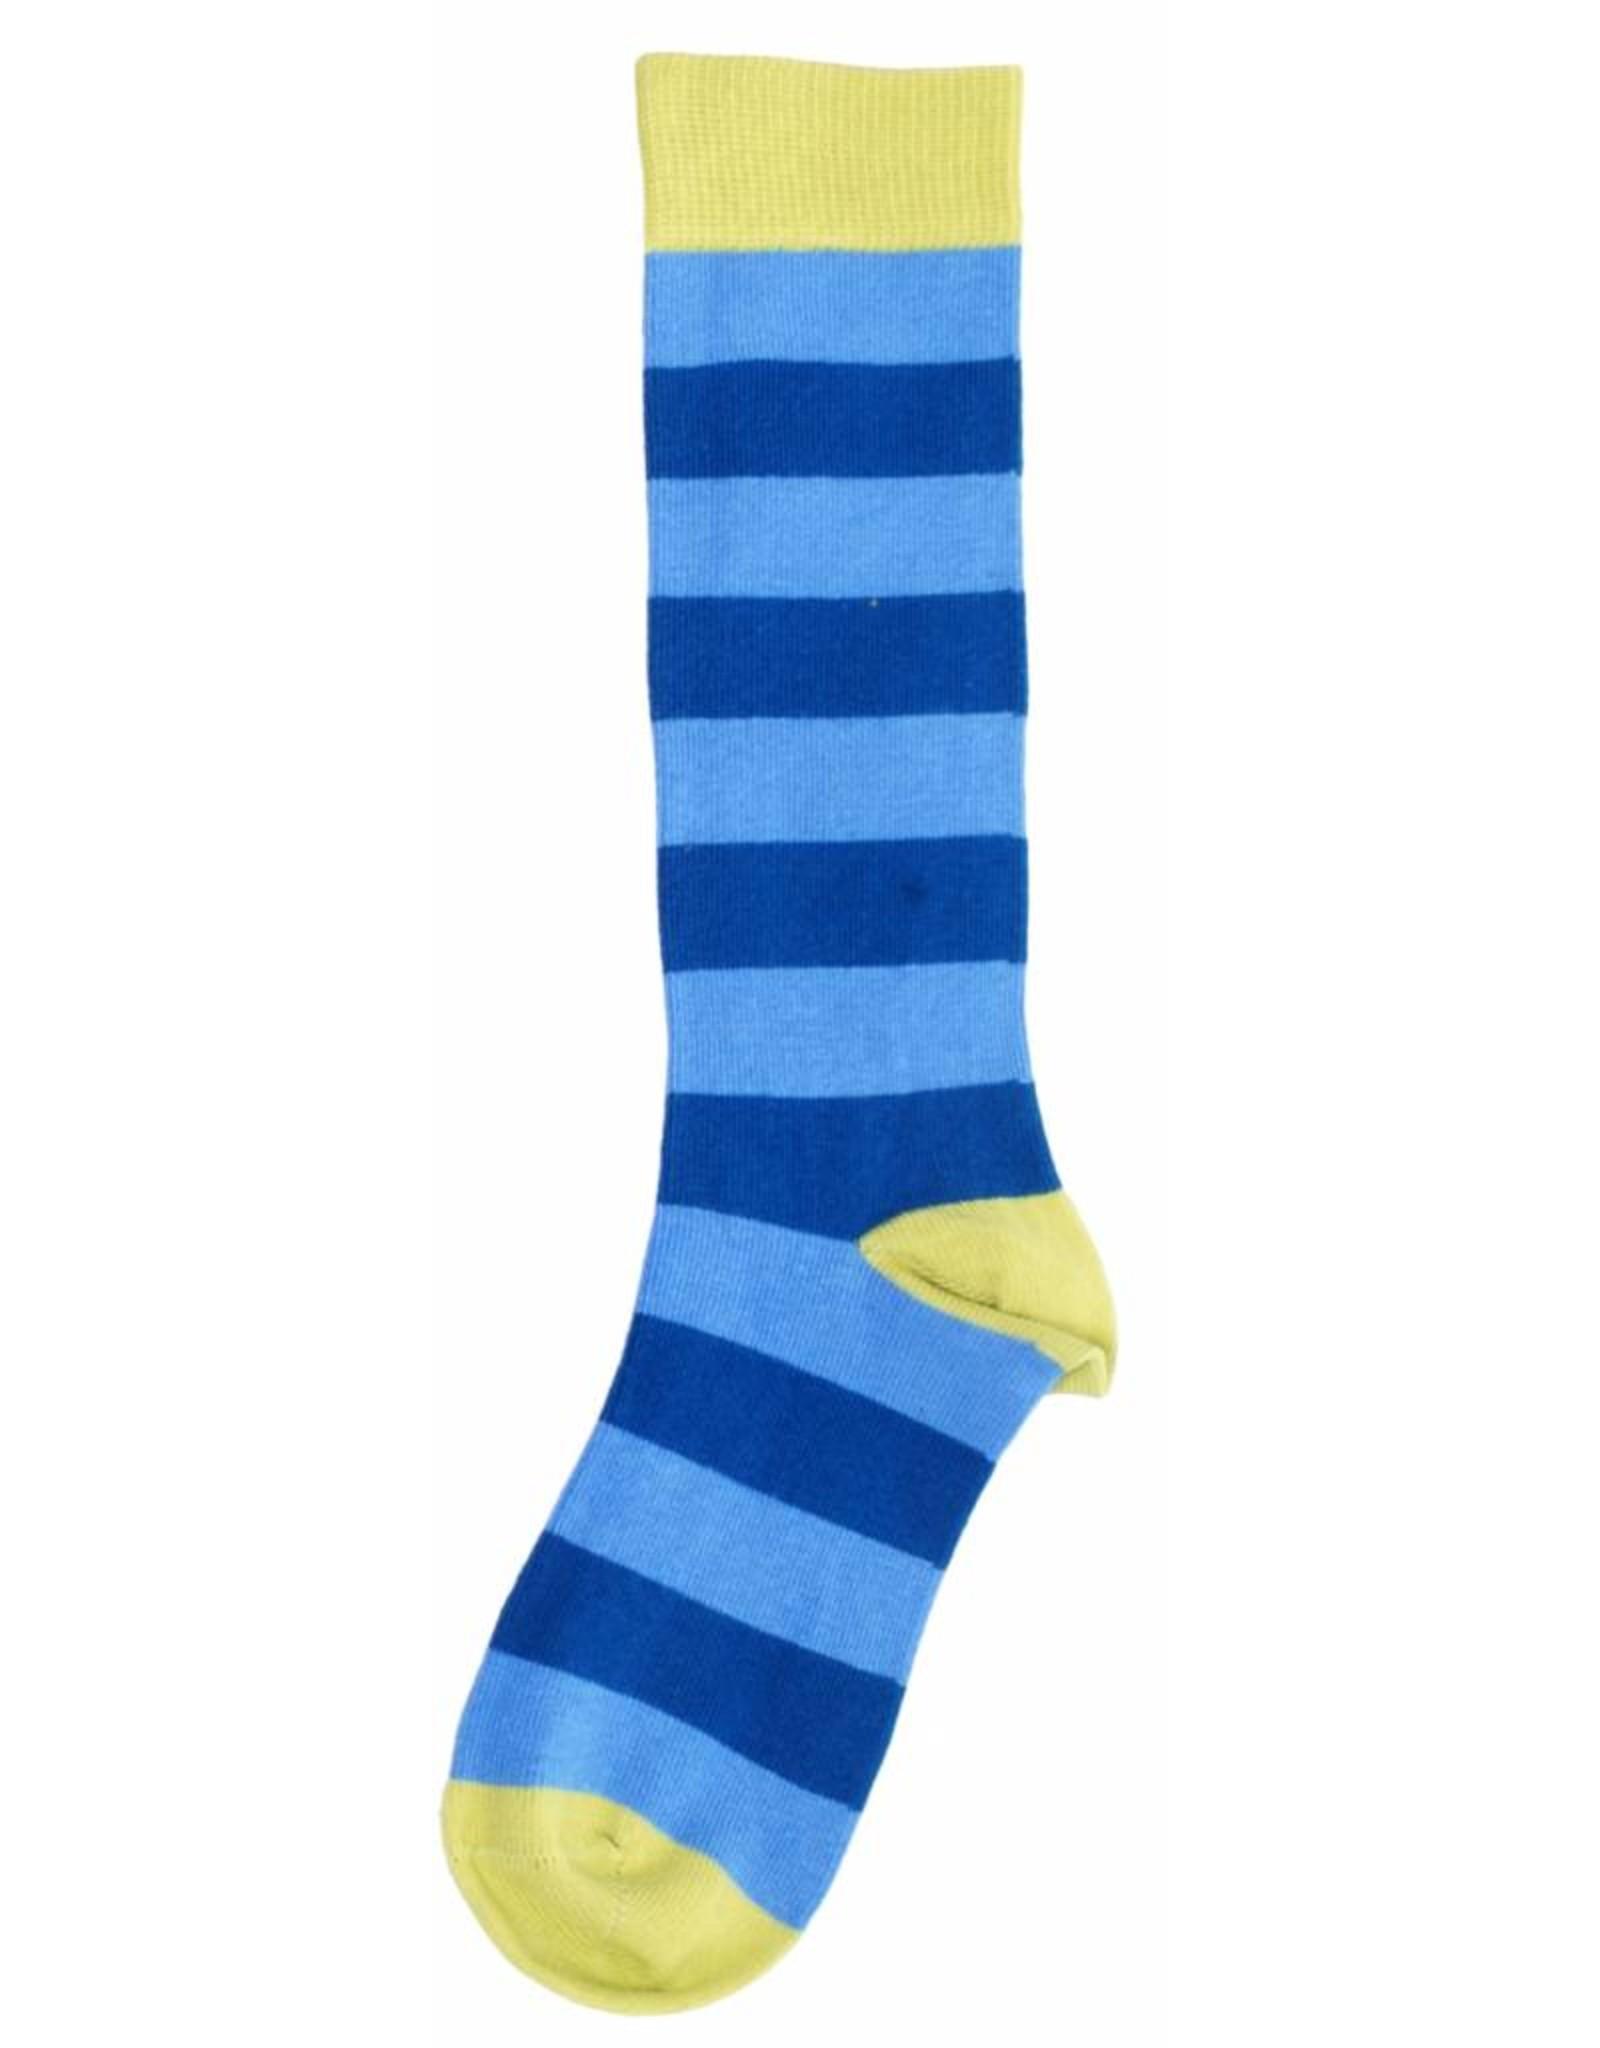 Duns Kids stockings - blue striped